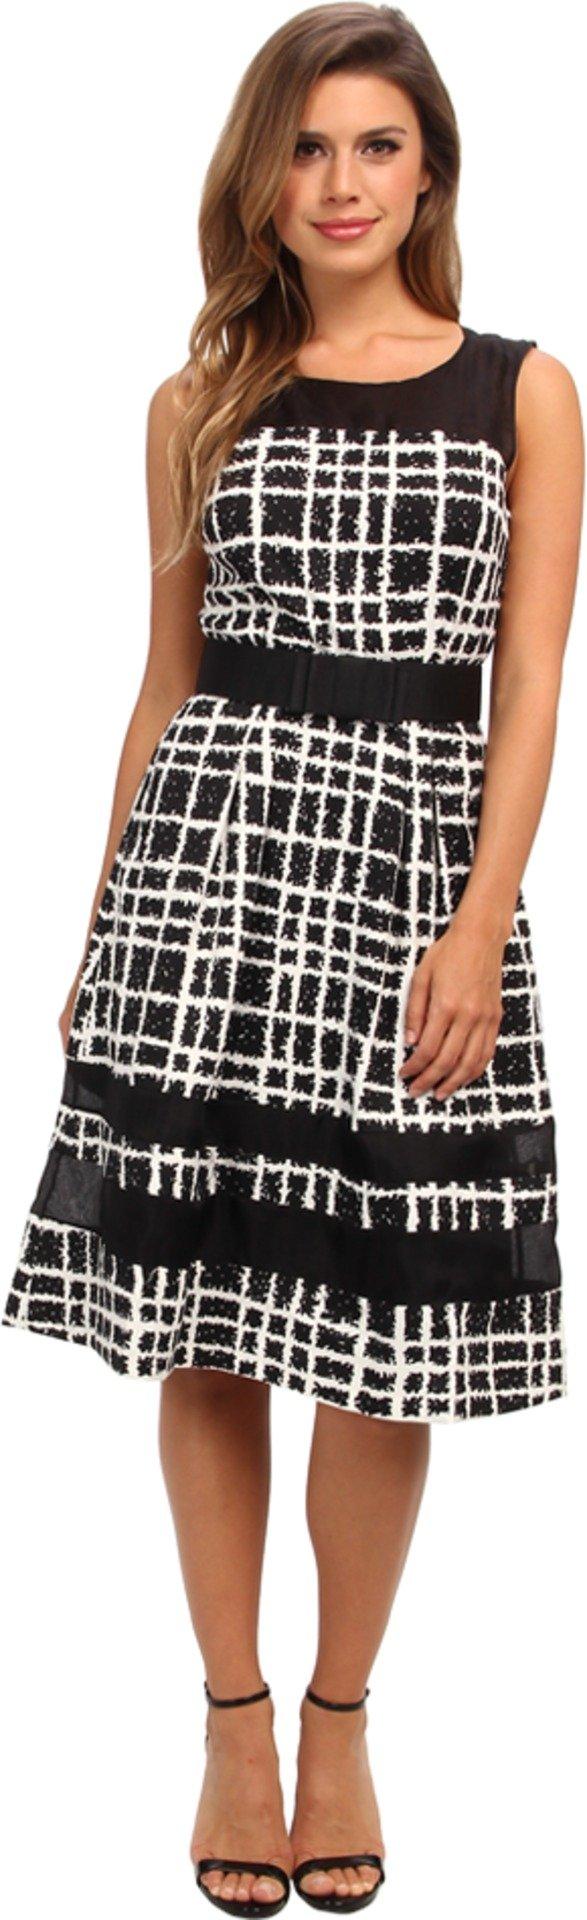 Badgley mischka womenus plaid print combo cocktail black multi dress